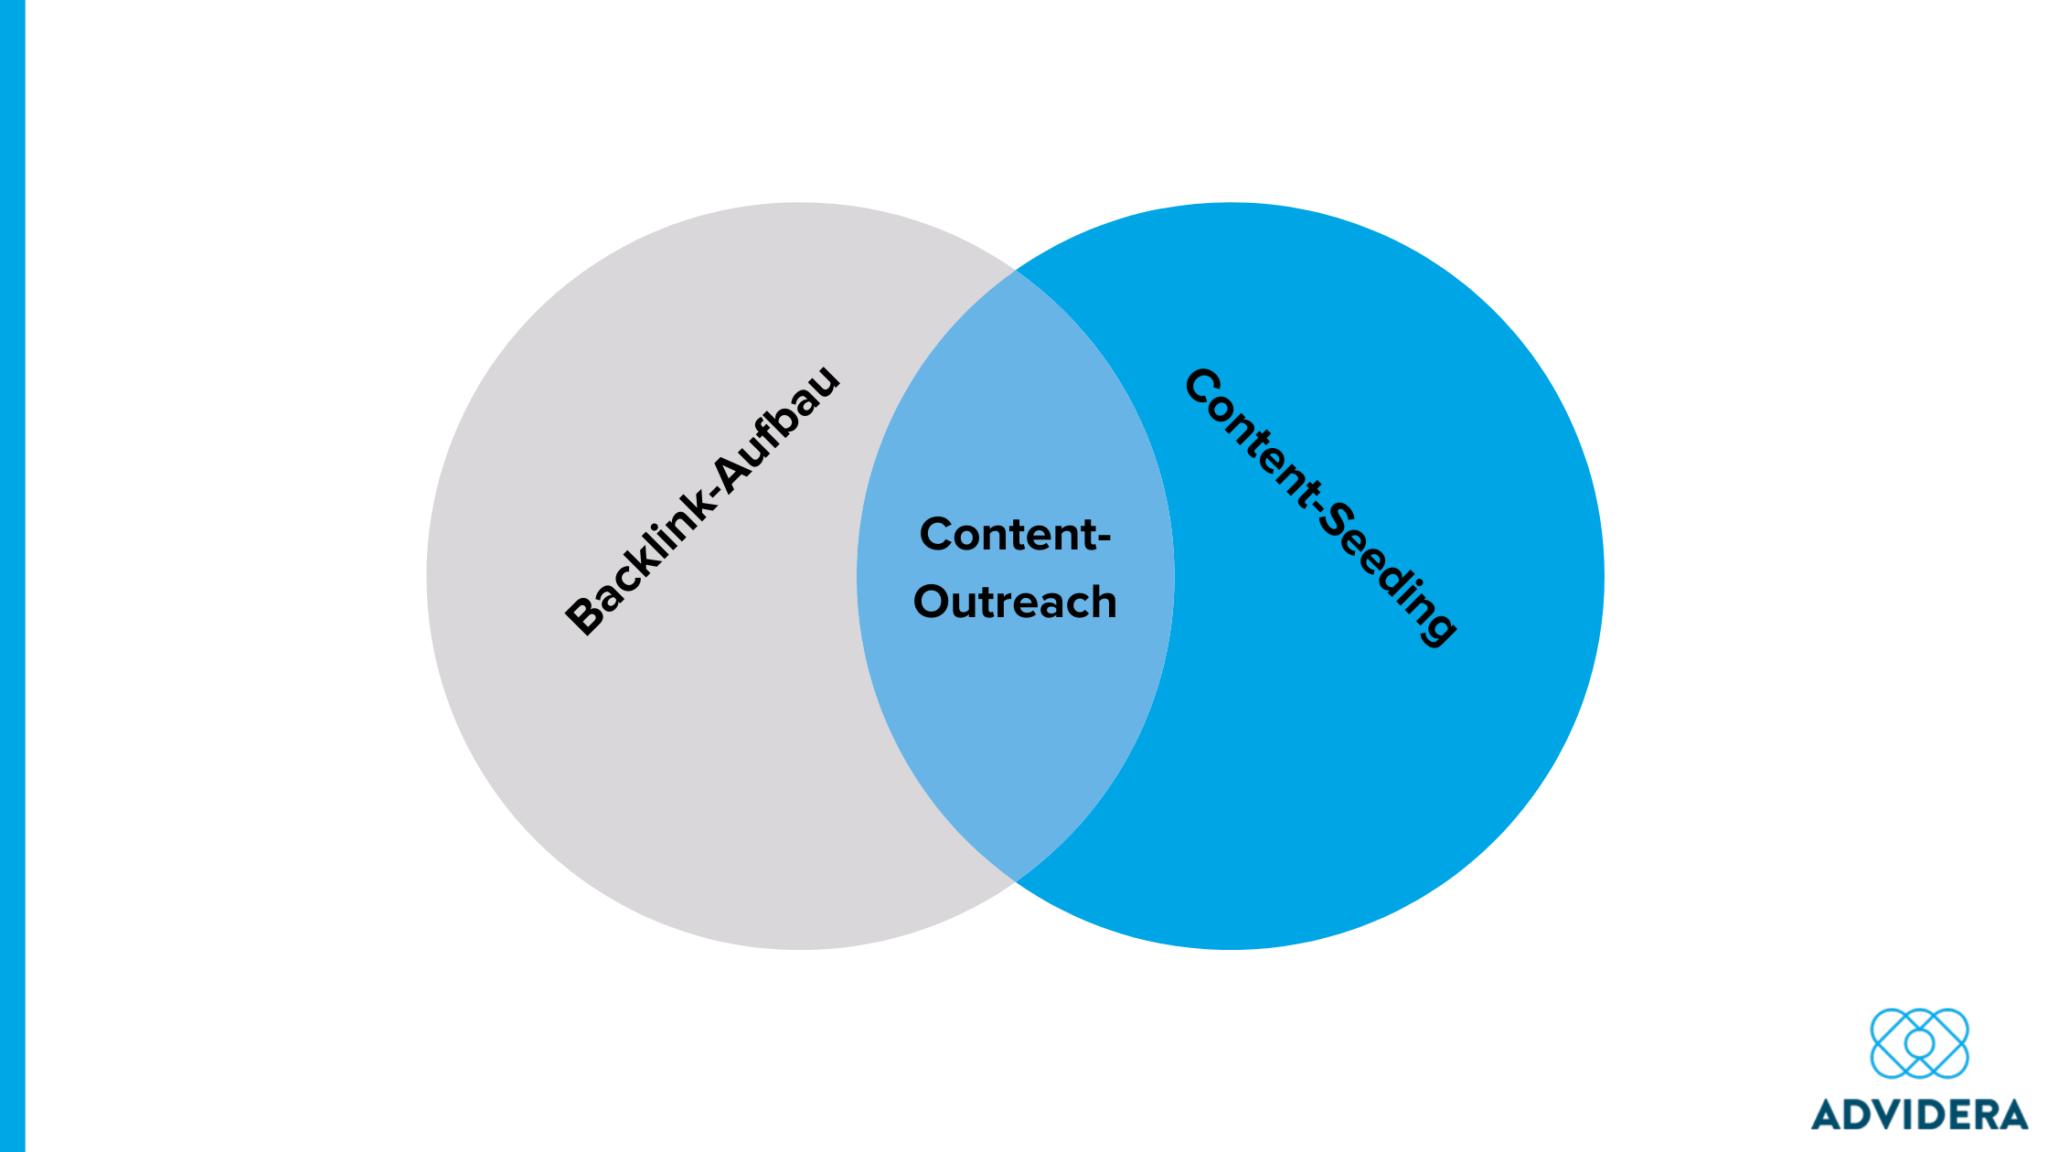 Content-Outreach